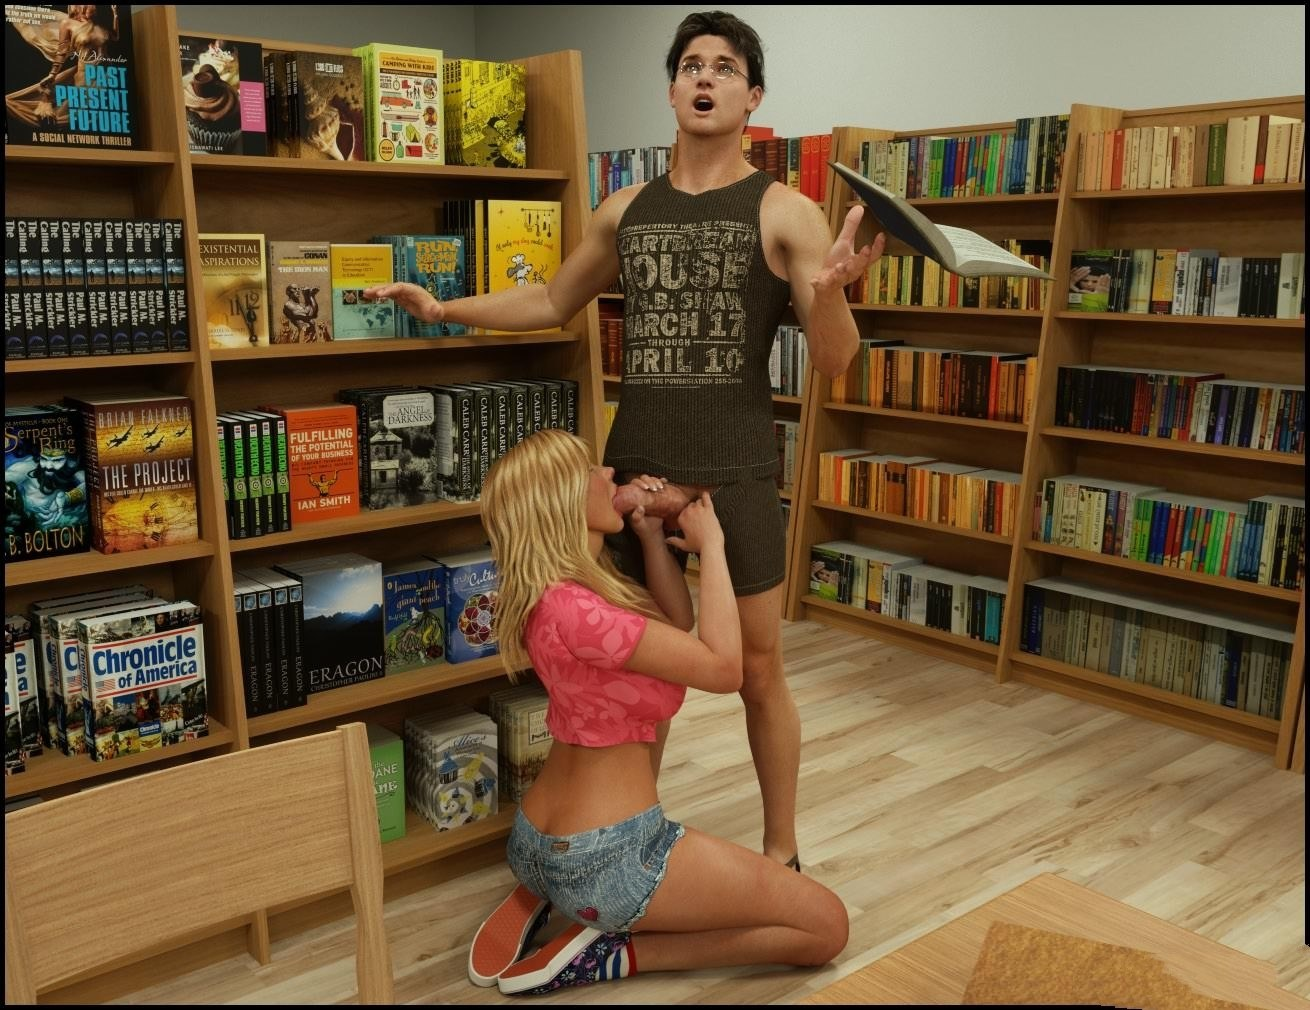 Blackadder- The library